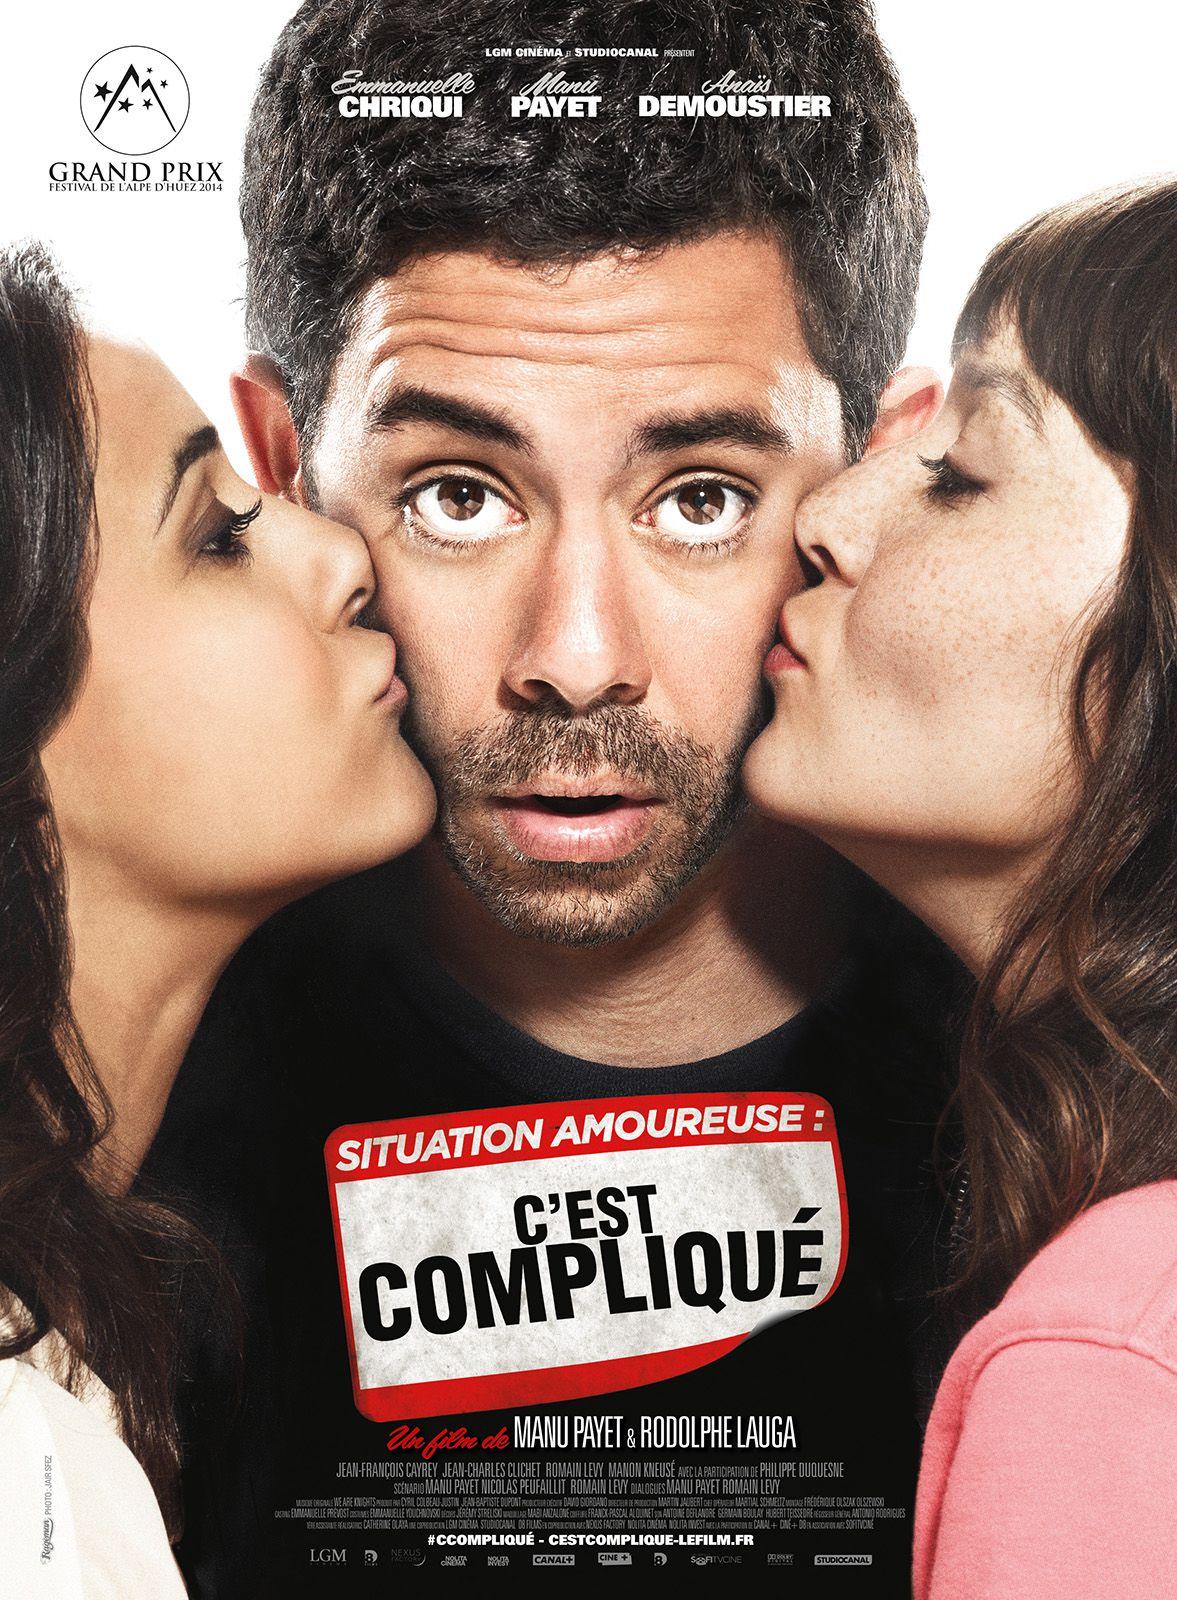 Situation amoureuse : C'est compliqué - Film (2014)